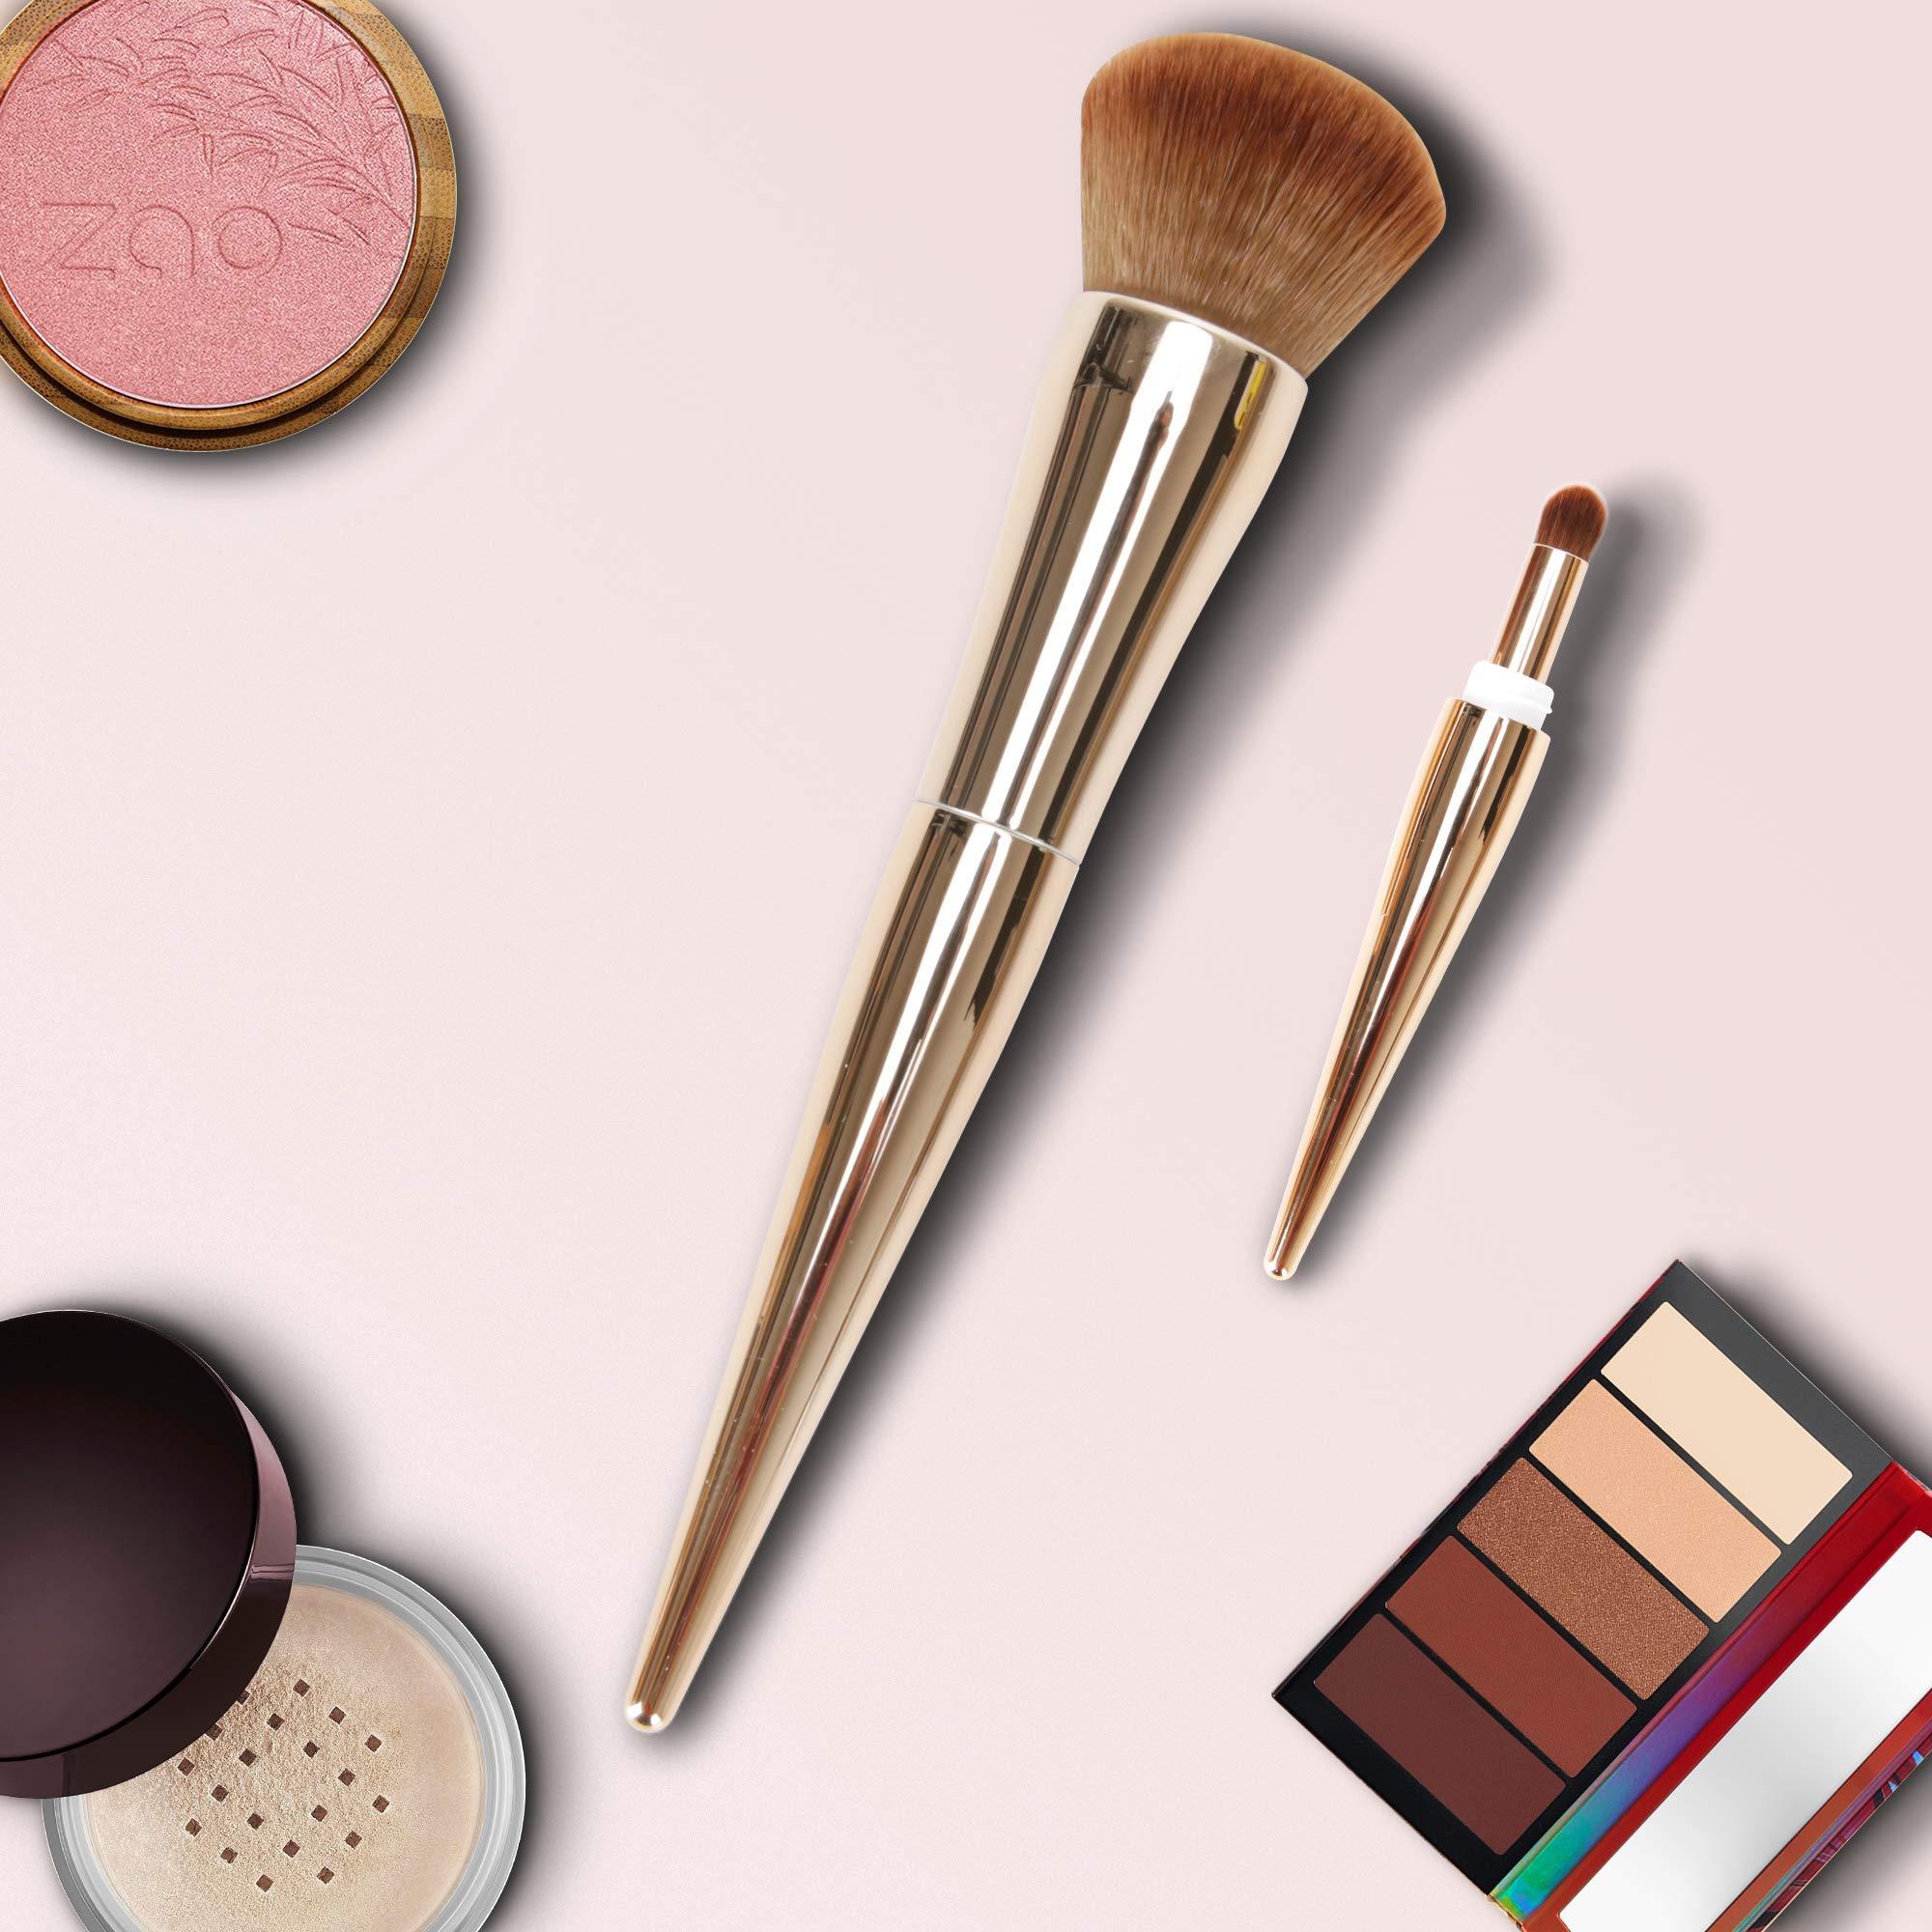 Powder Brush, 2-in-1 Makeup Brushes for Blush Brush & Bronzer Brush Rose Gold